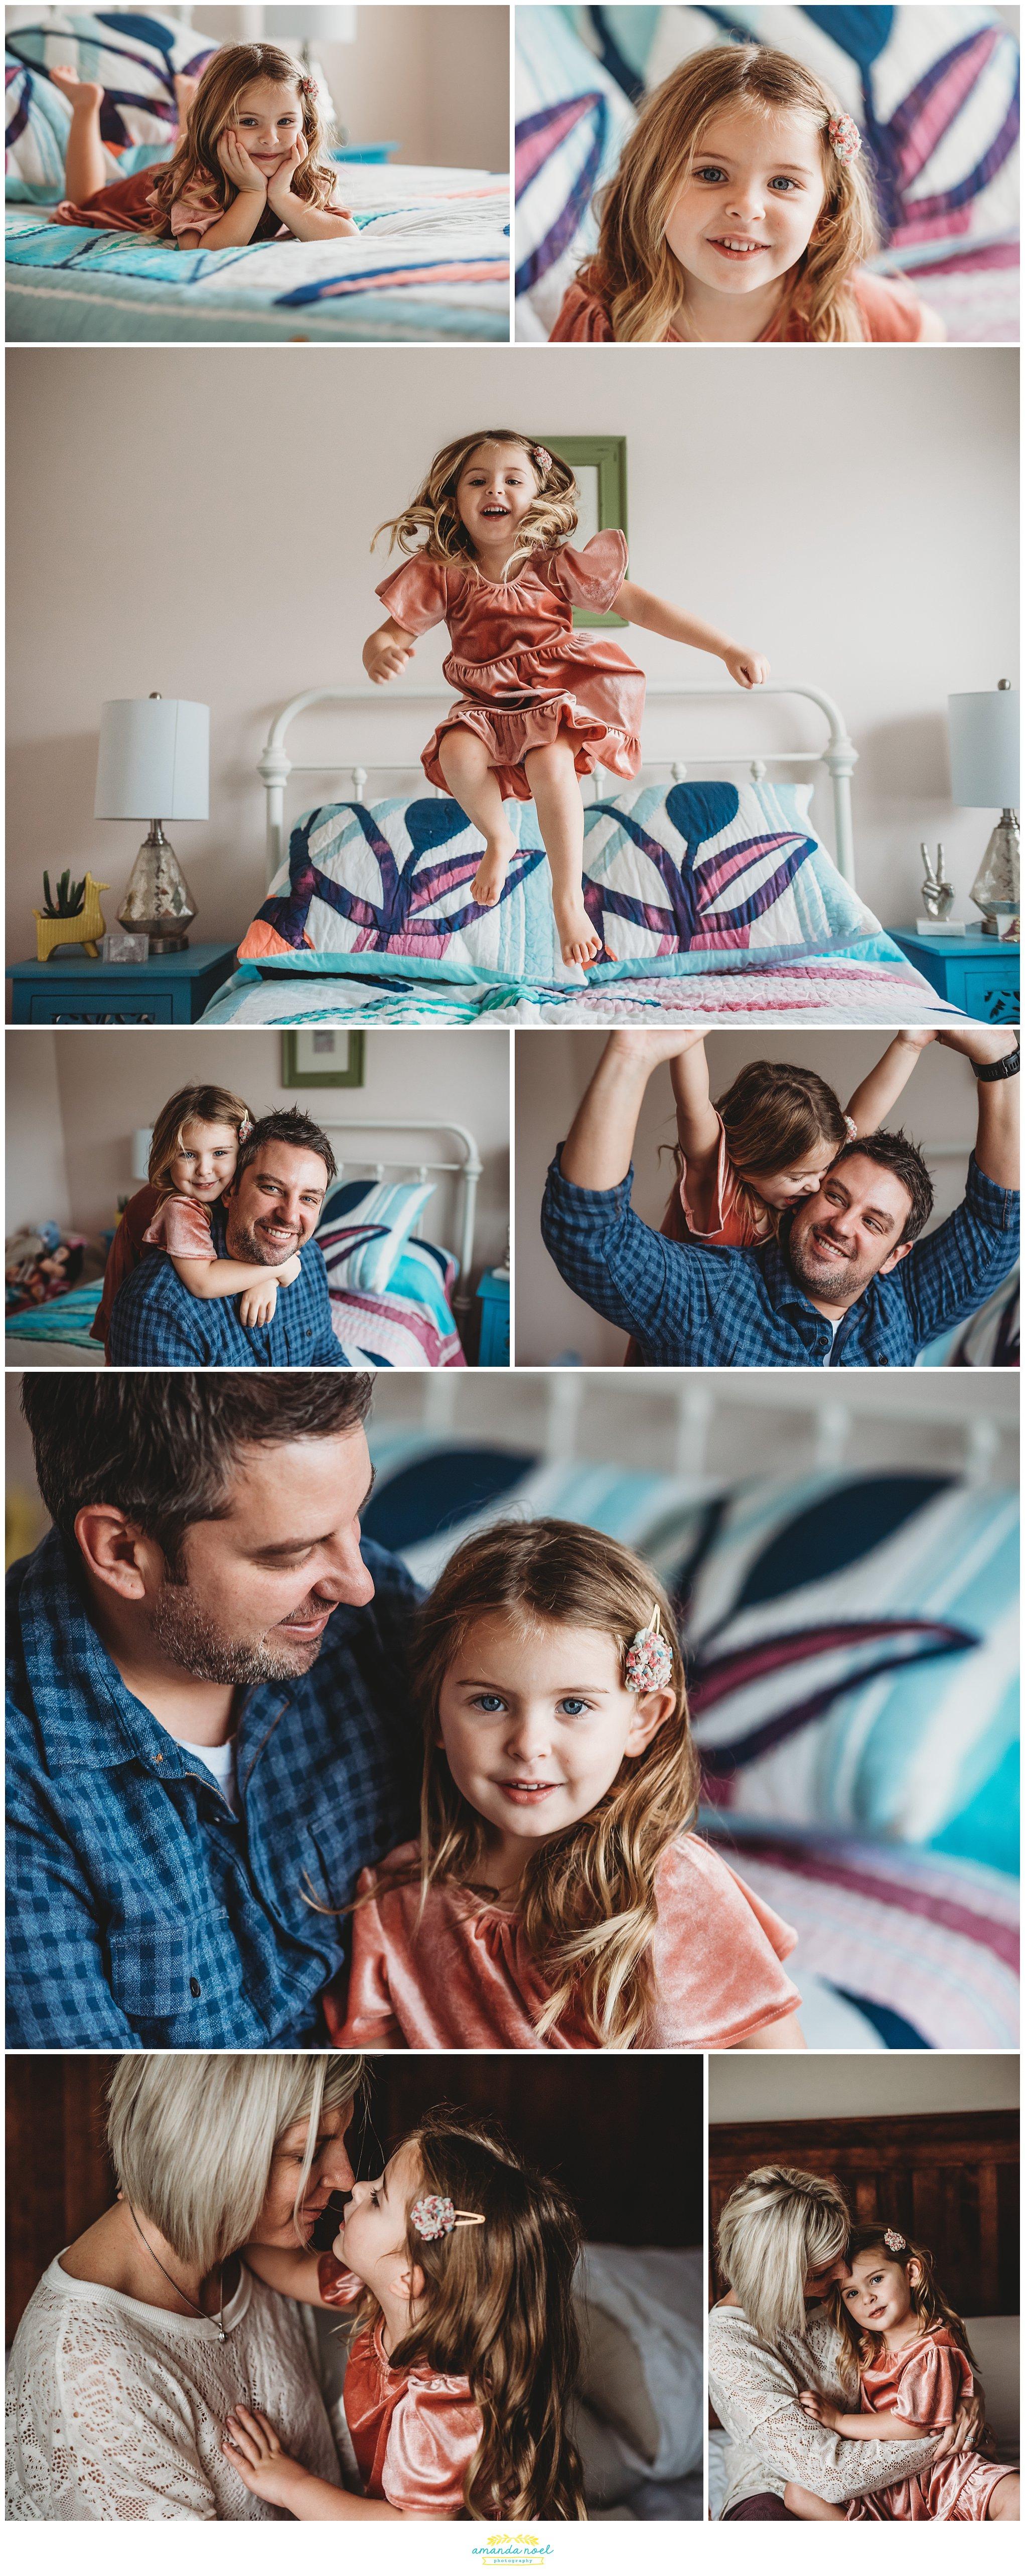 Springboro Ohio Family Photographer | Amanda Noel Photography | in home lifestyle photo session